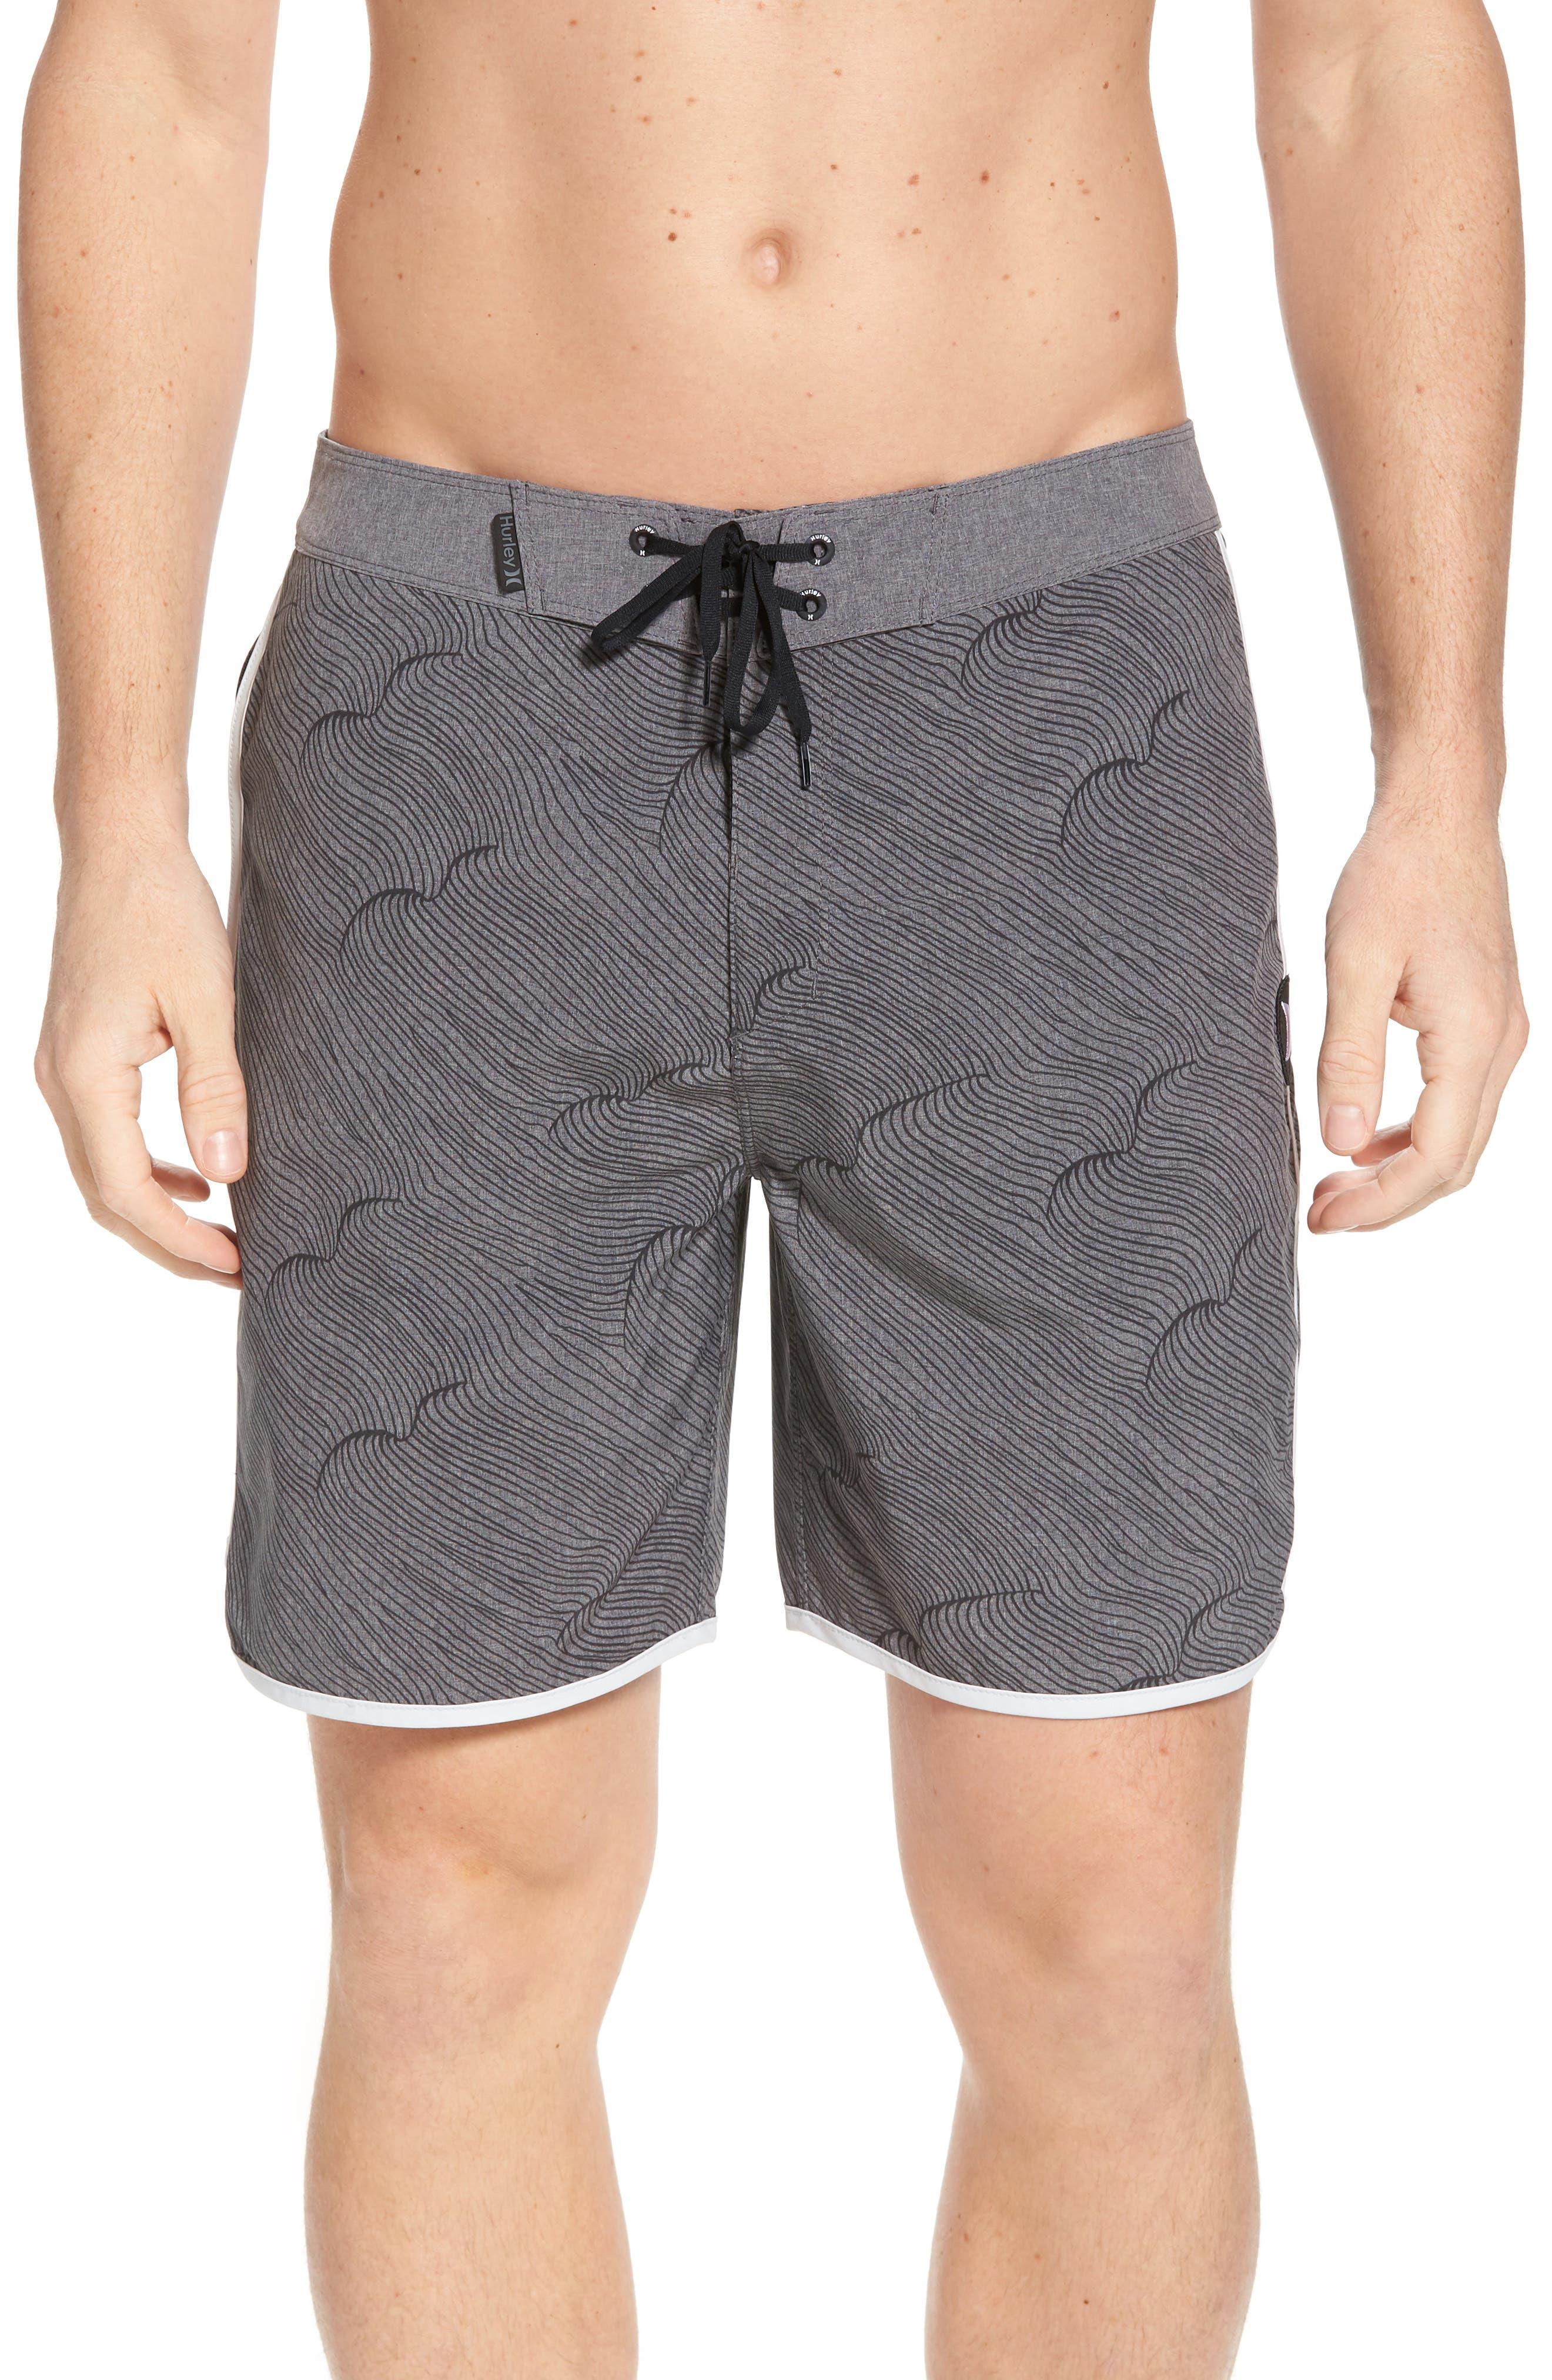 HURLEY Phantom Thalia Street Board Shorts, Main, color, 060